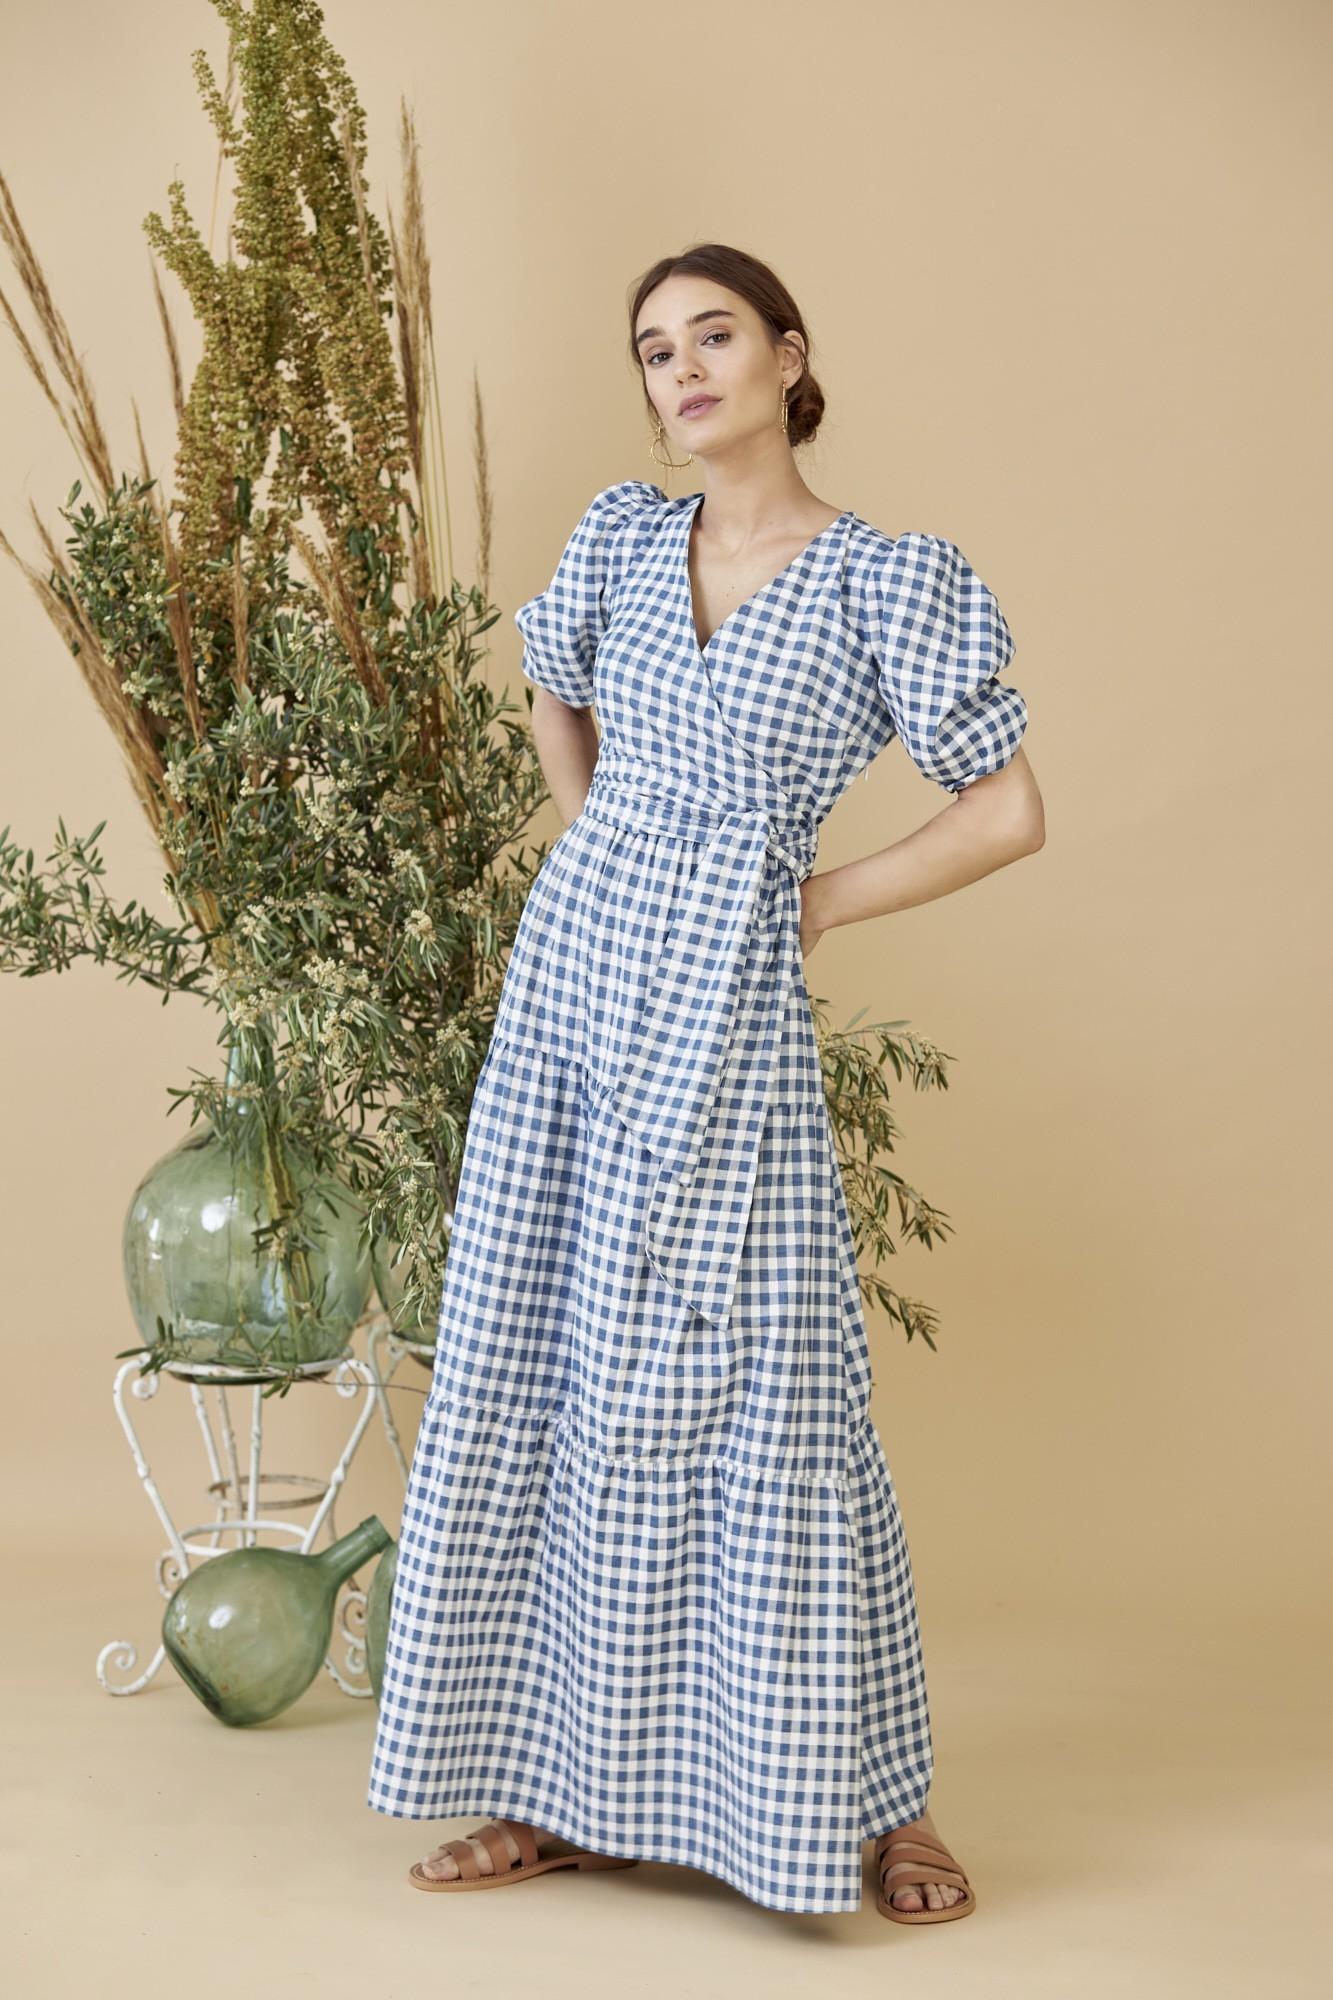 SISTER FADI BLUE DRESS